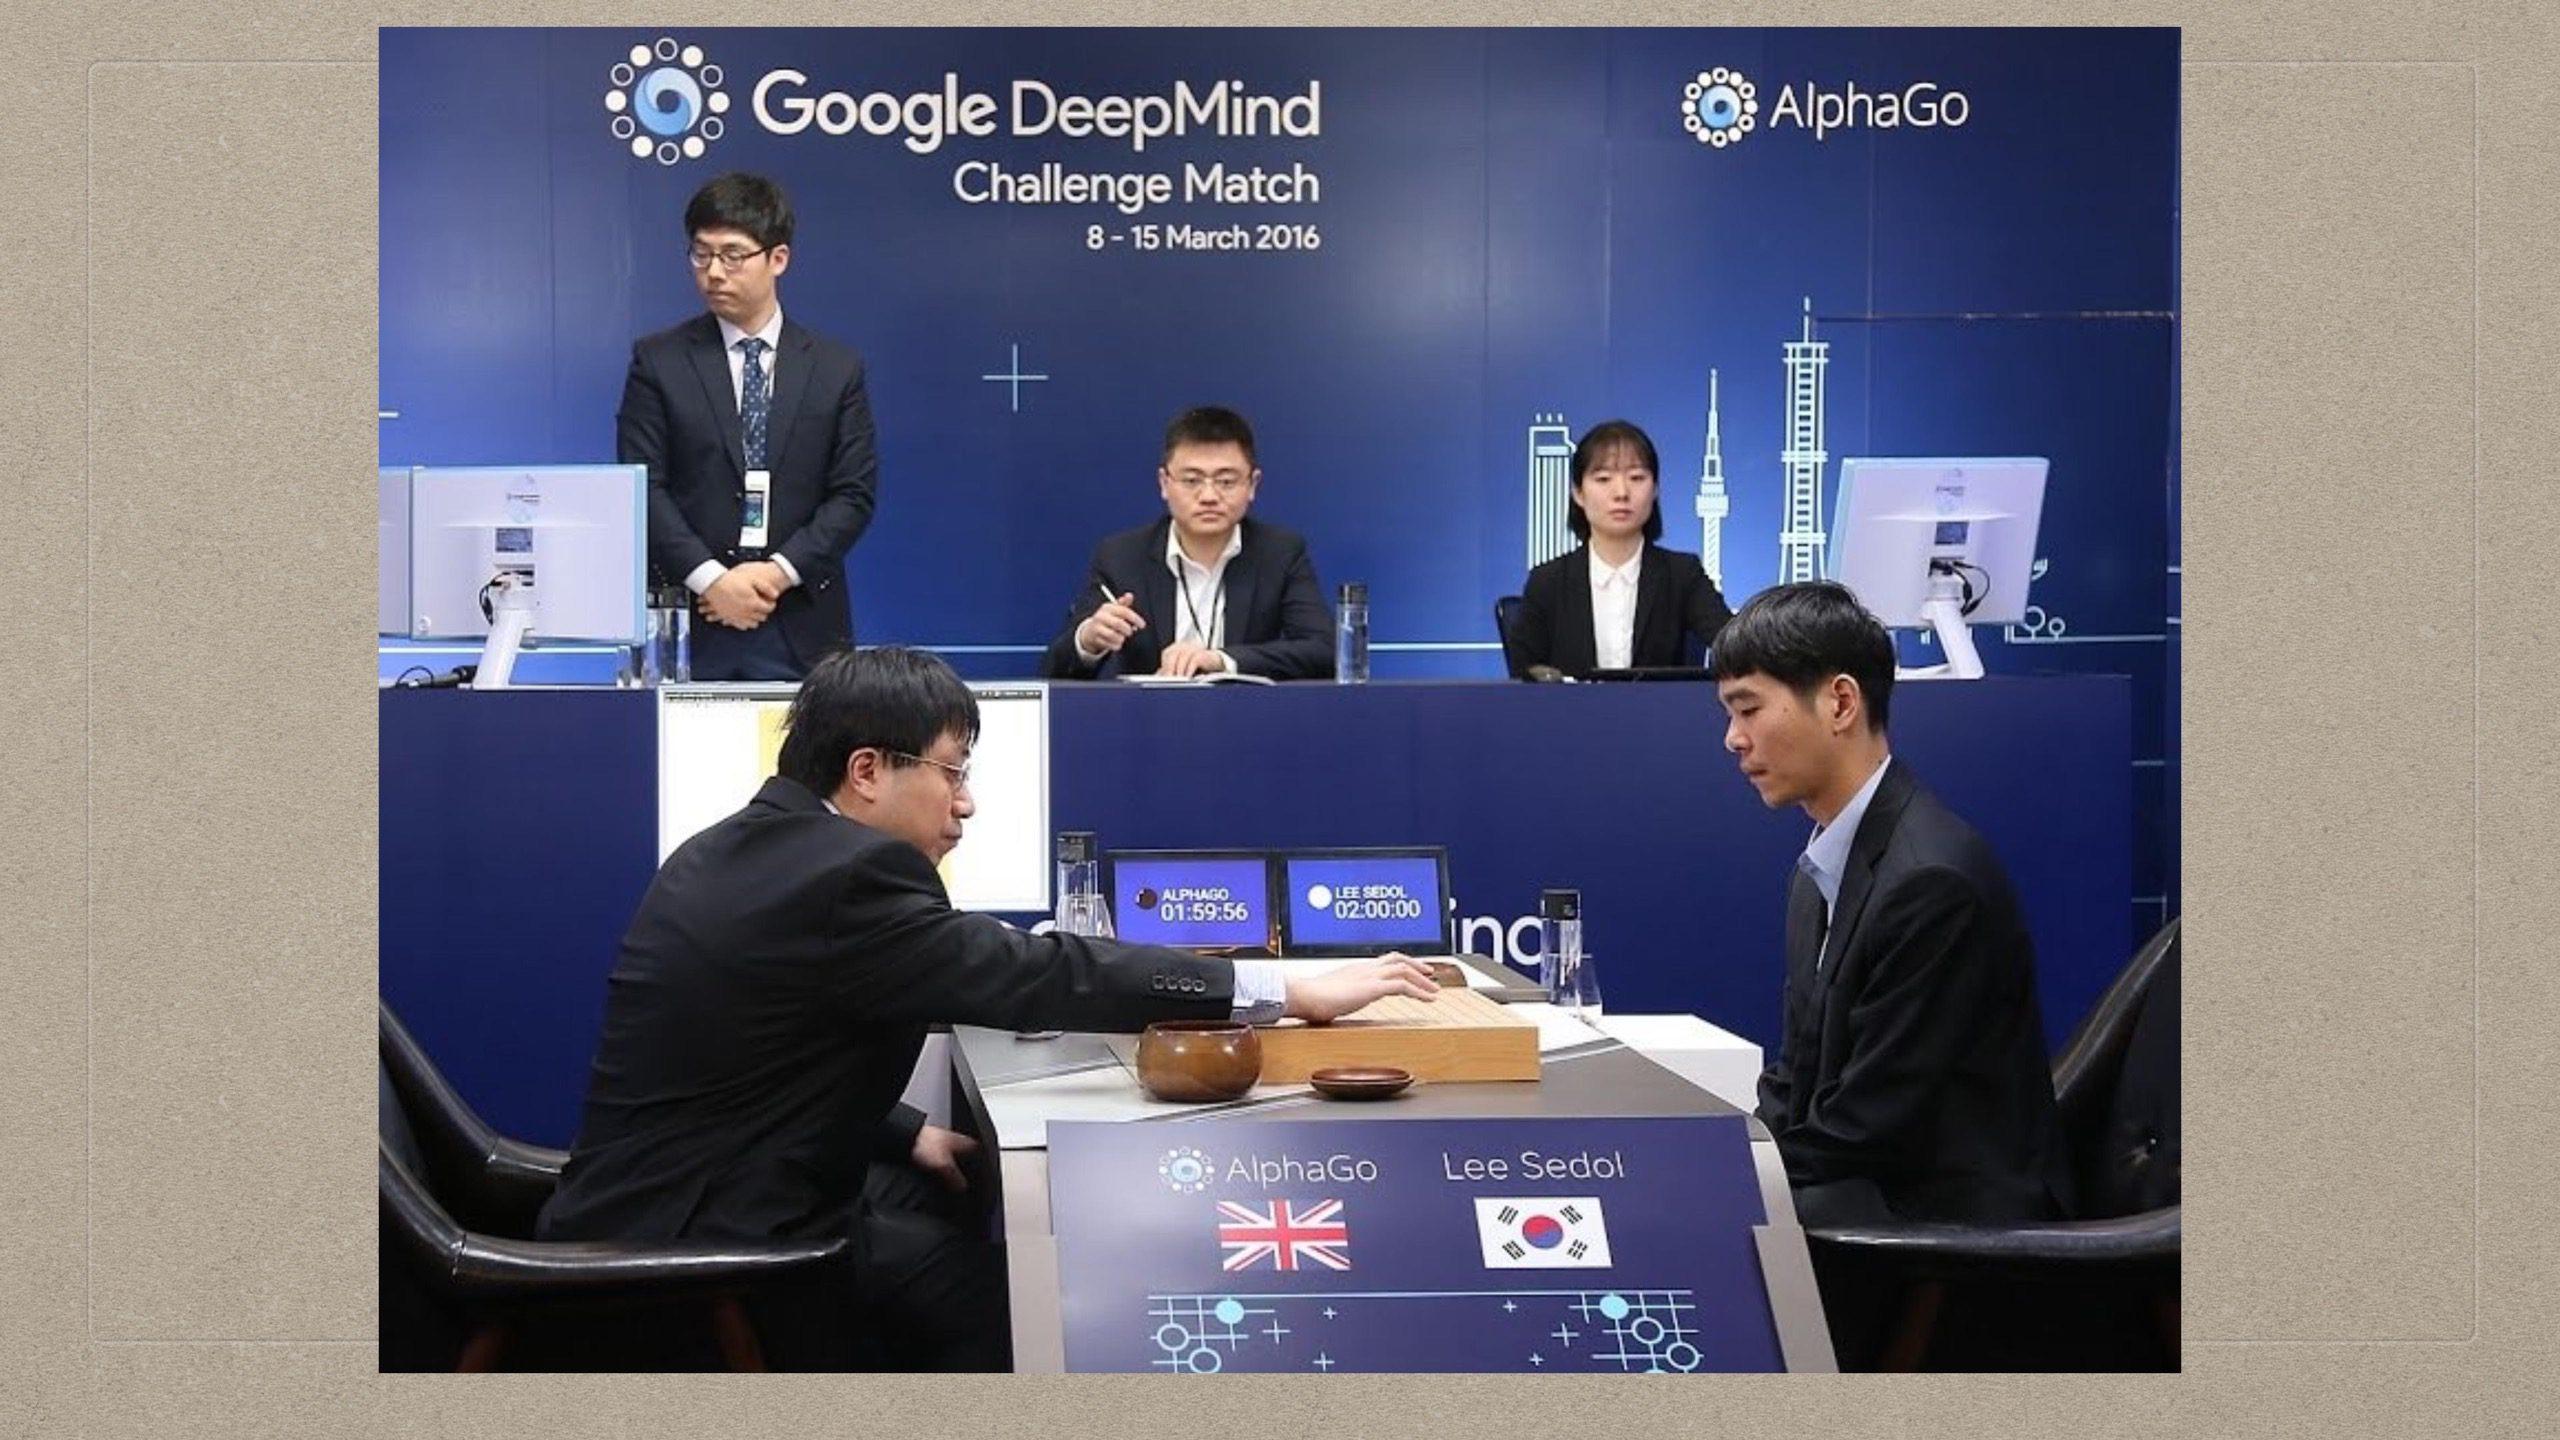 03-10-Lee Sedol and AlphaGo